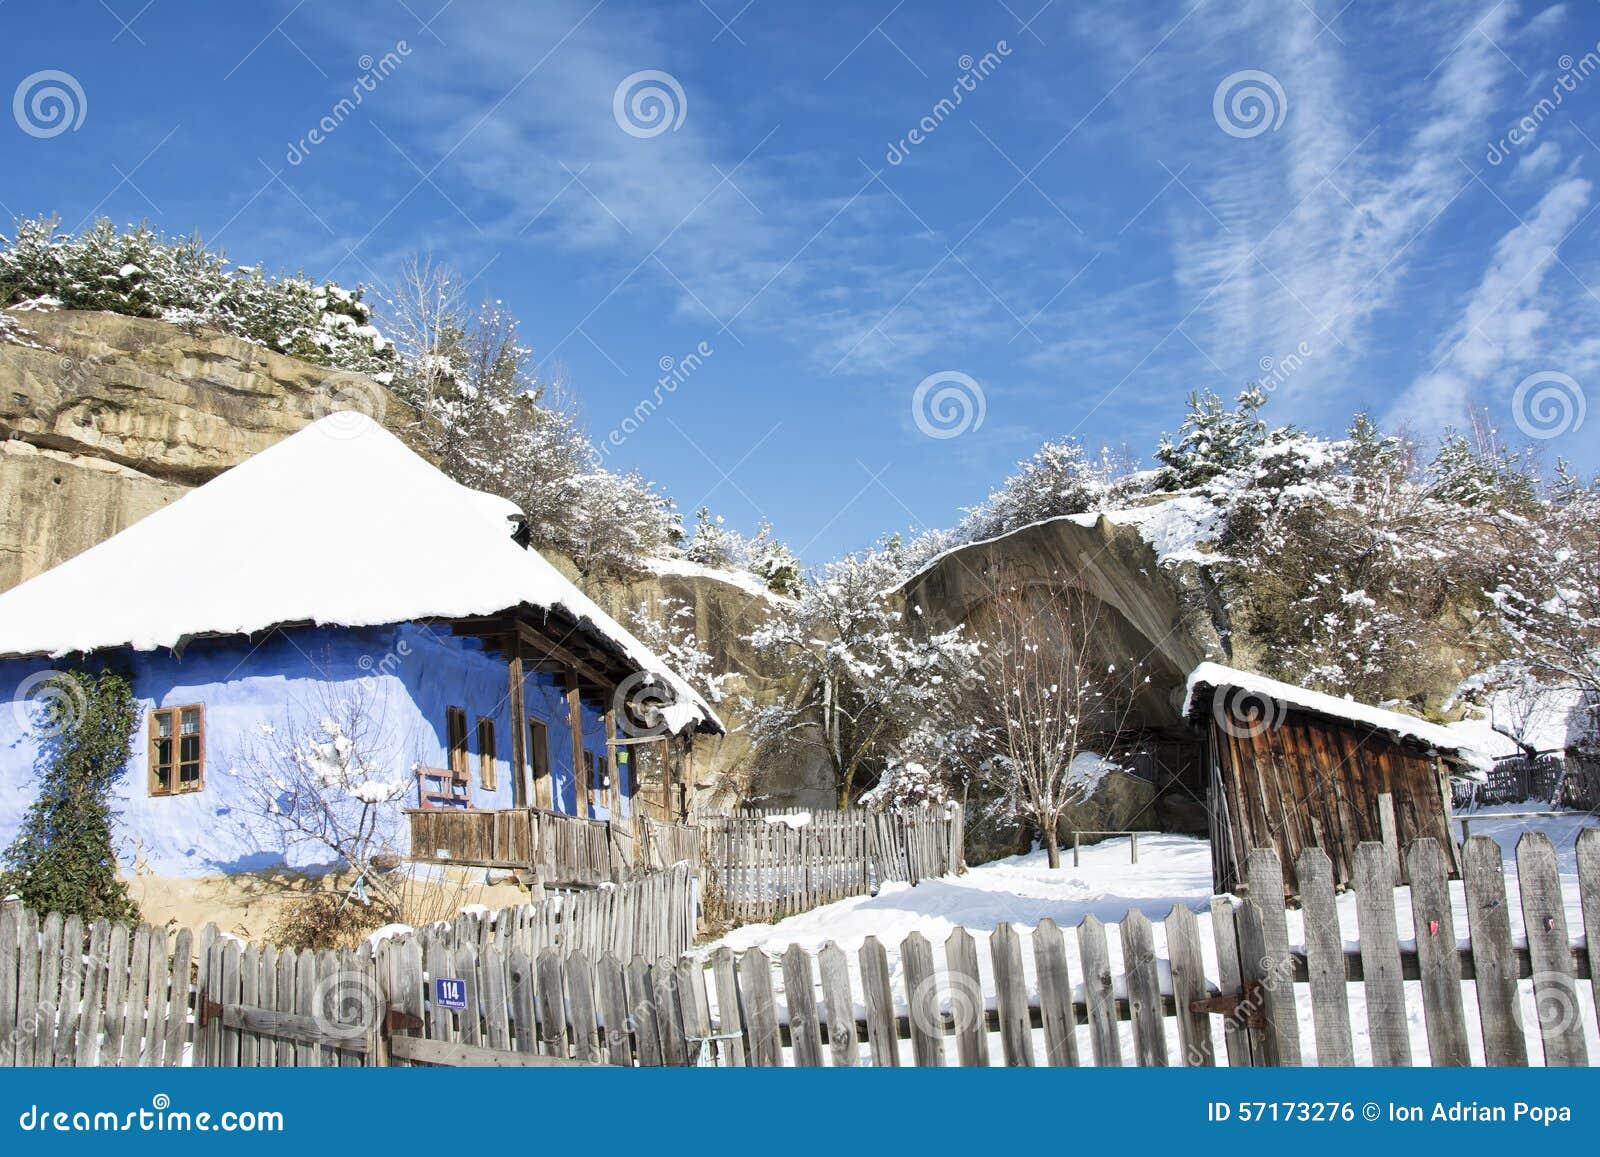 Vieille maison en hiver